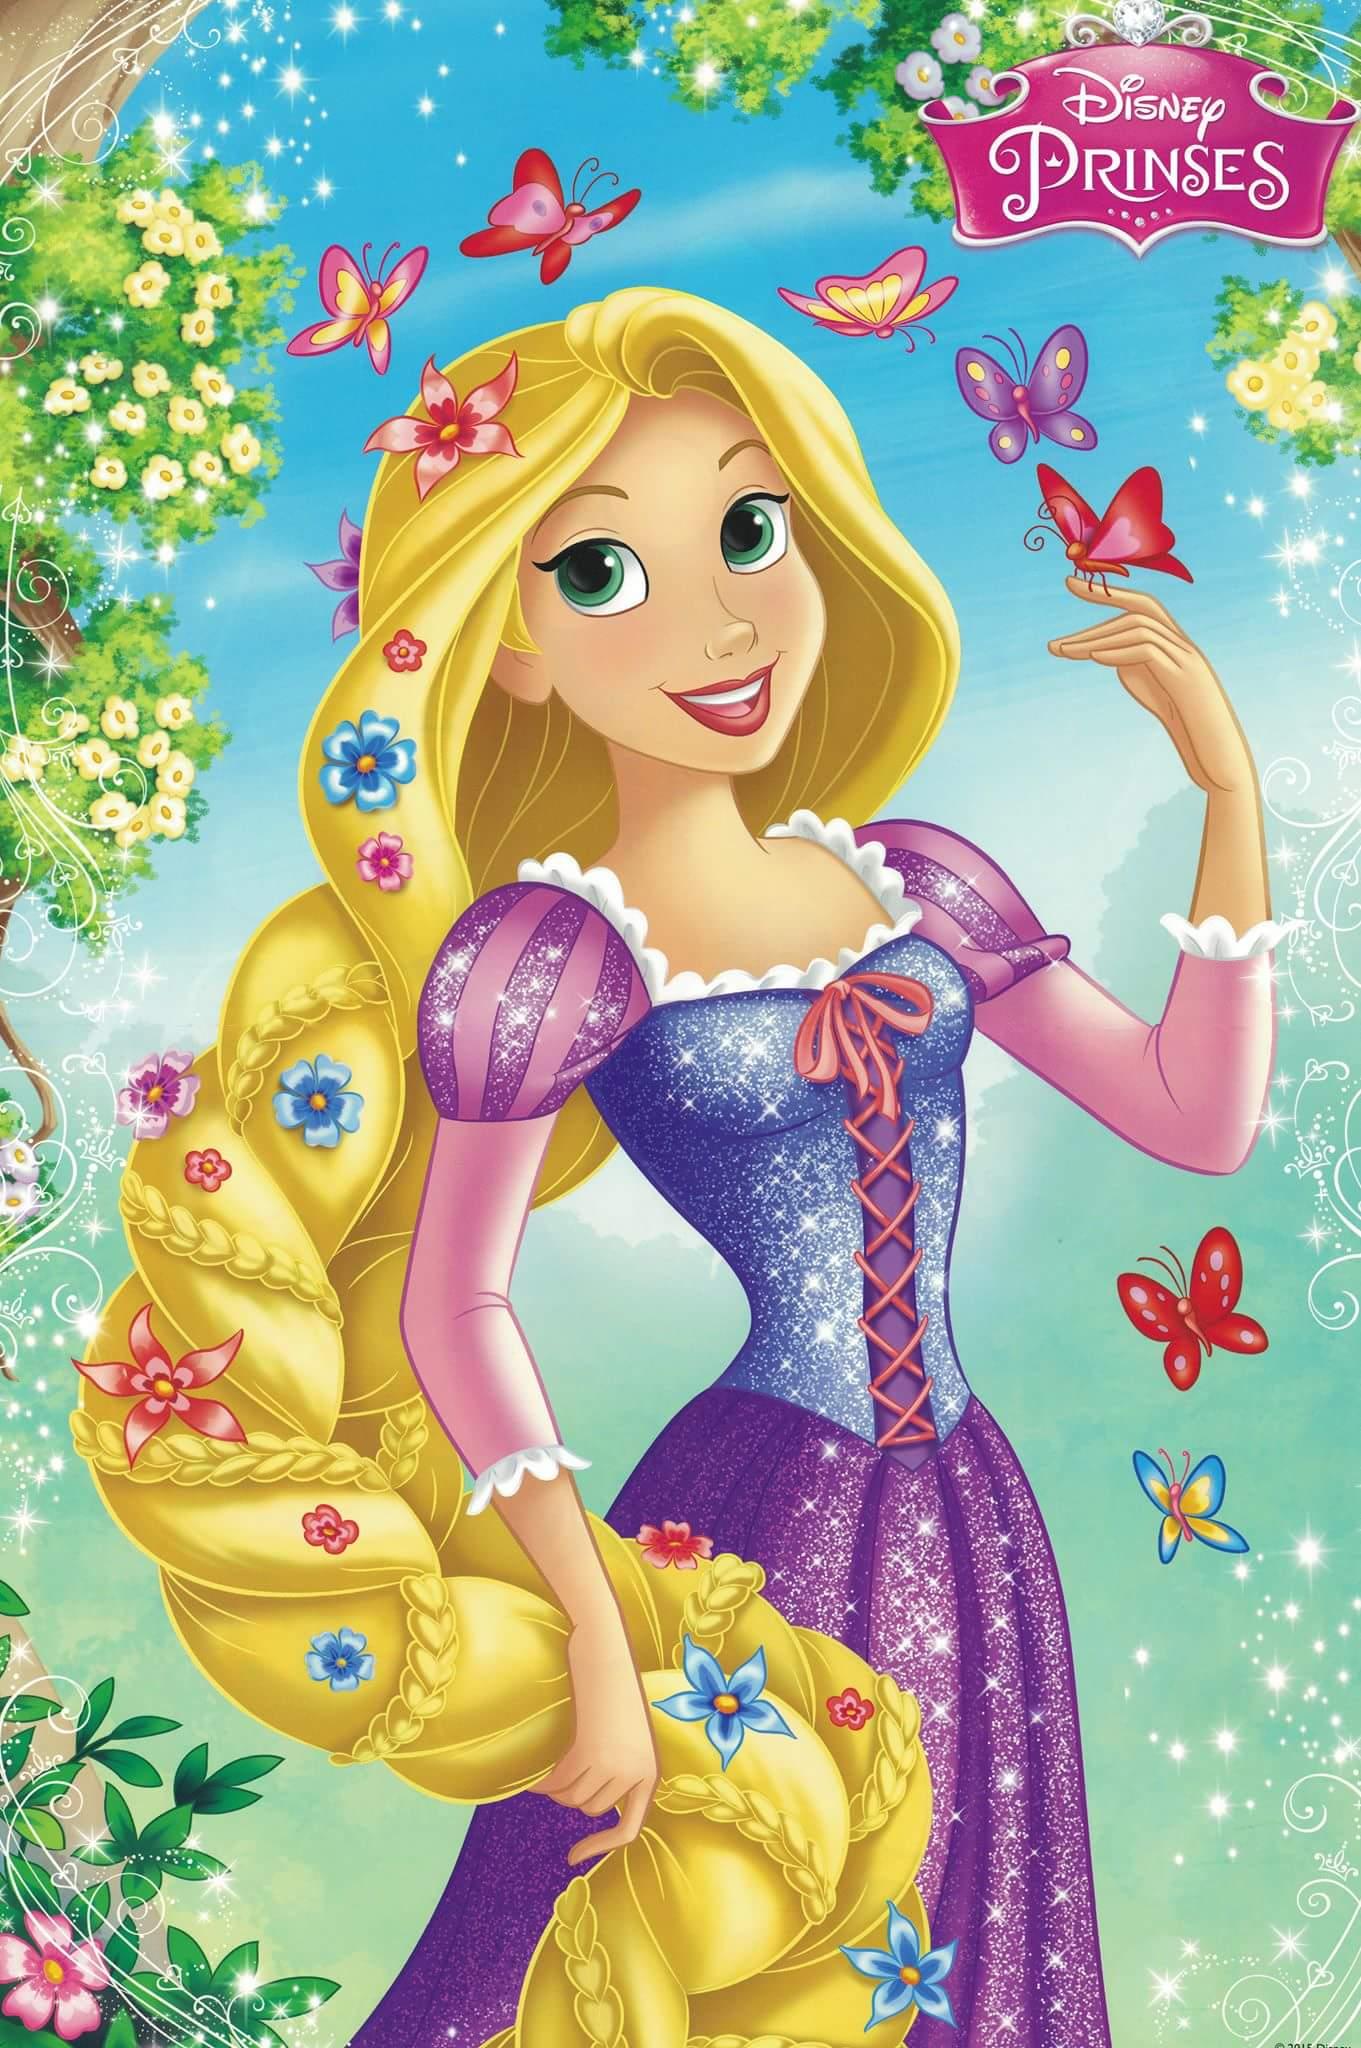 Rapunzel - Disney Princess Photo (39040278) - Fanpop